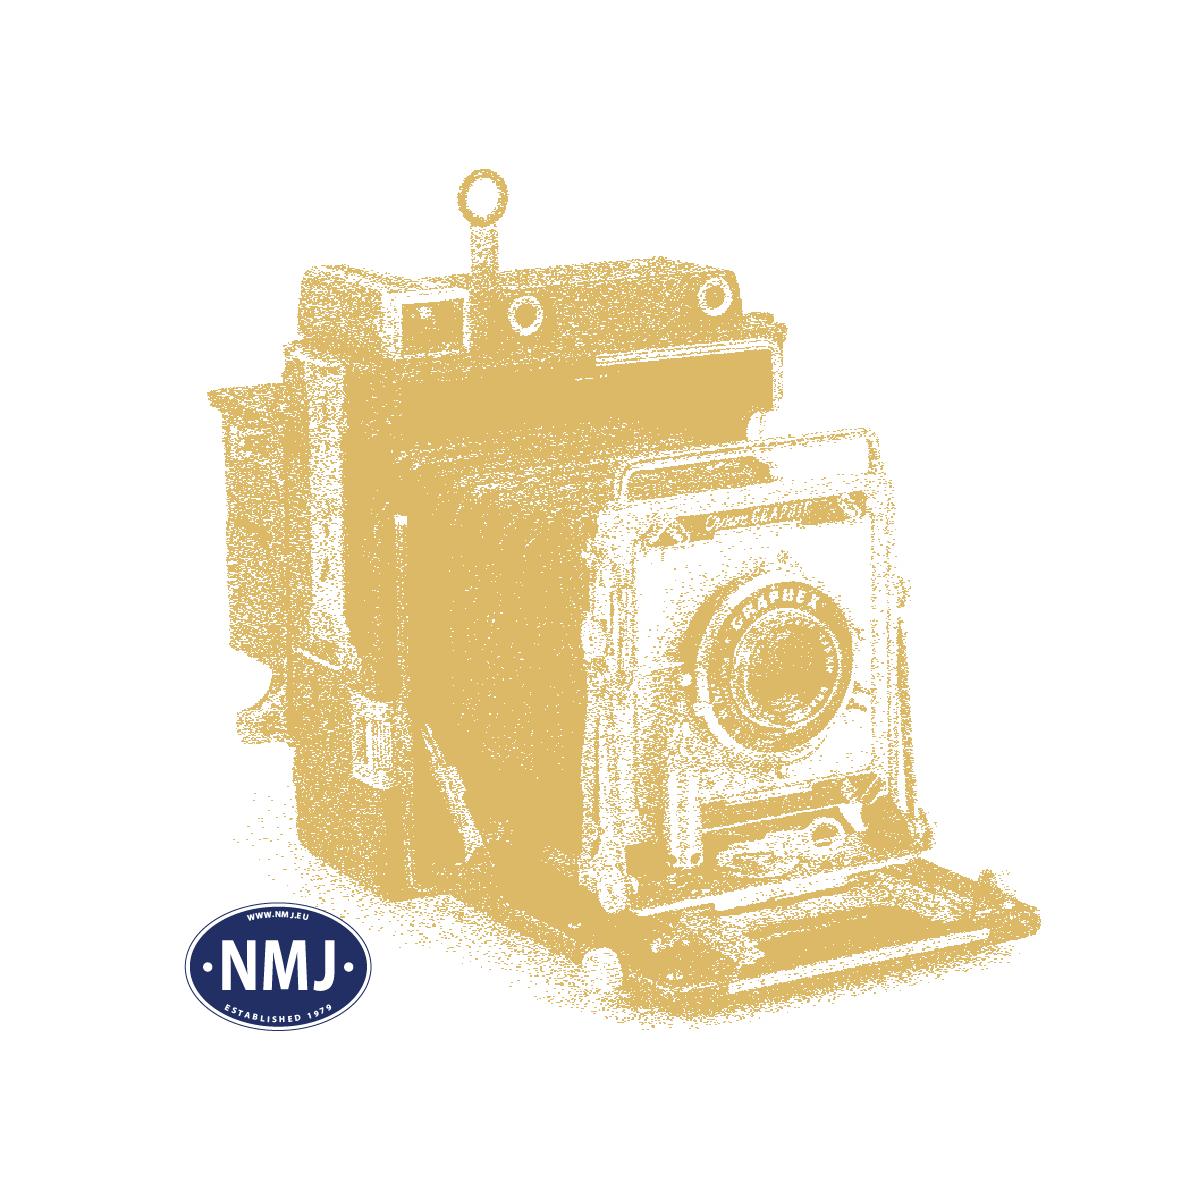 NMJT131.304 - NMJ Topline NSB B3-2 25522, Type 3, Nydesign